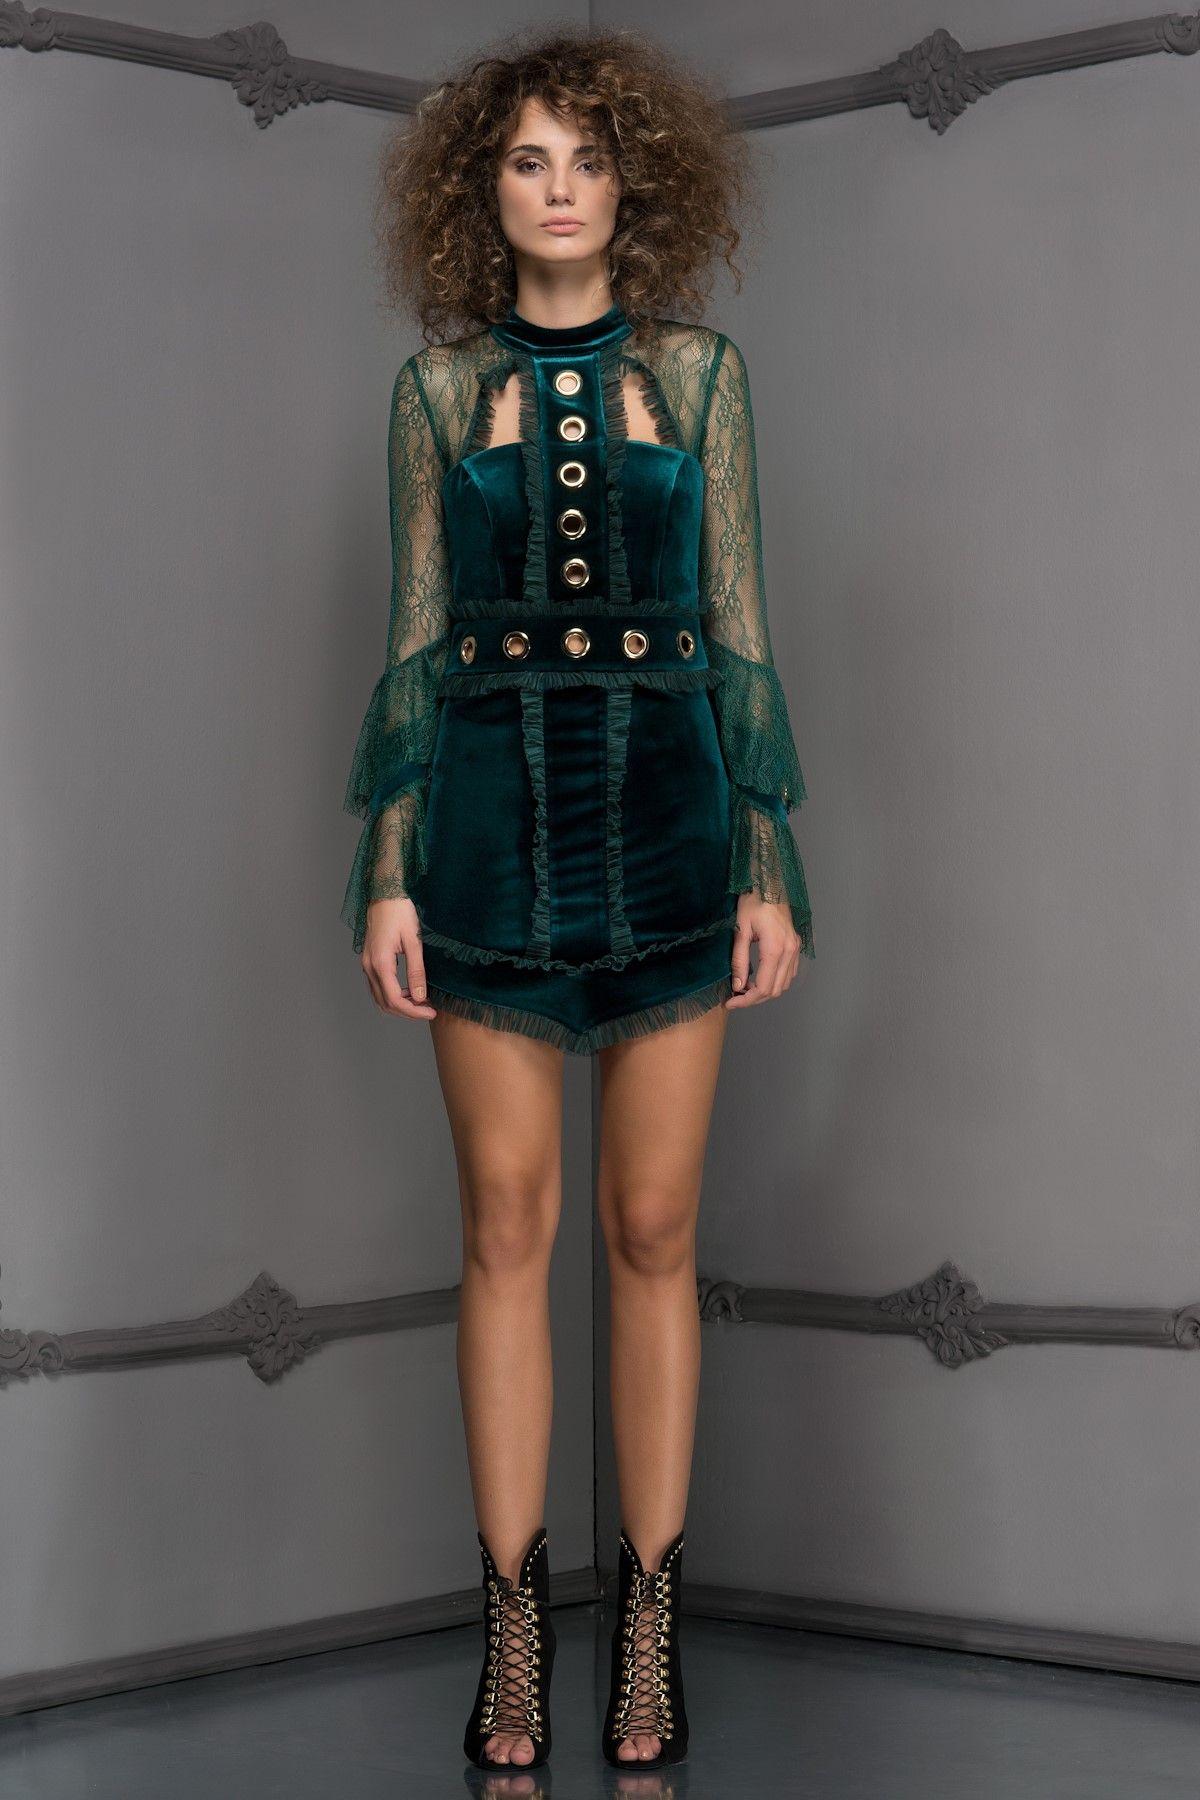 Gwen Yesil Elbise Mlwaw17de6991 Raisa Vanessa For Trendyol Trendyol Elbise Moda Stilleri Genc Modasi